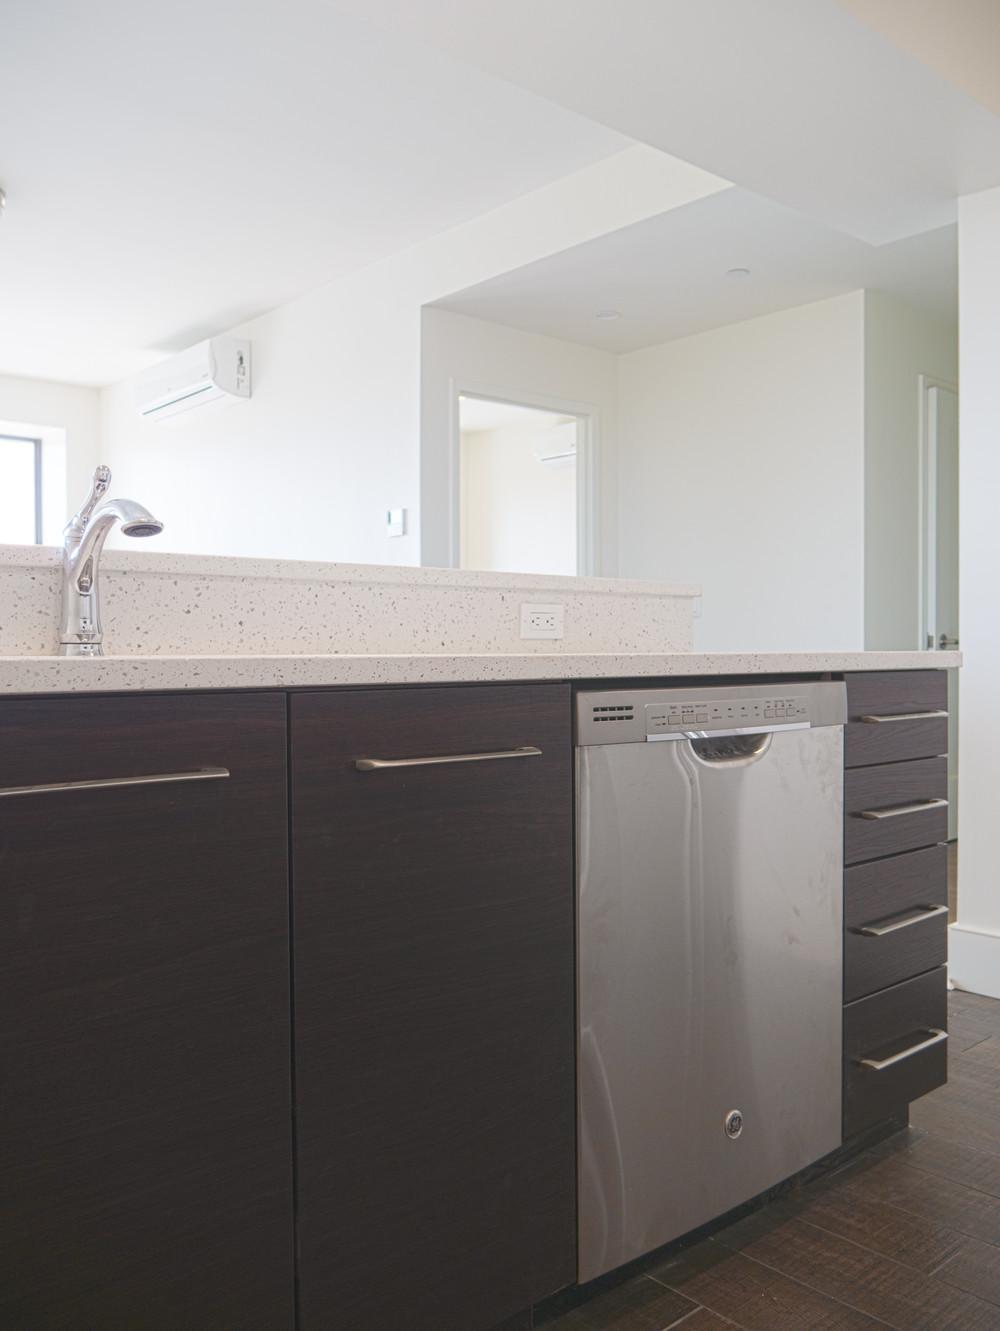 6 dishwasher.jpg